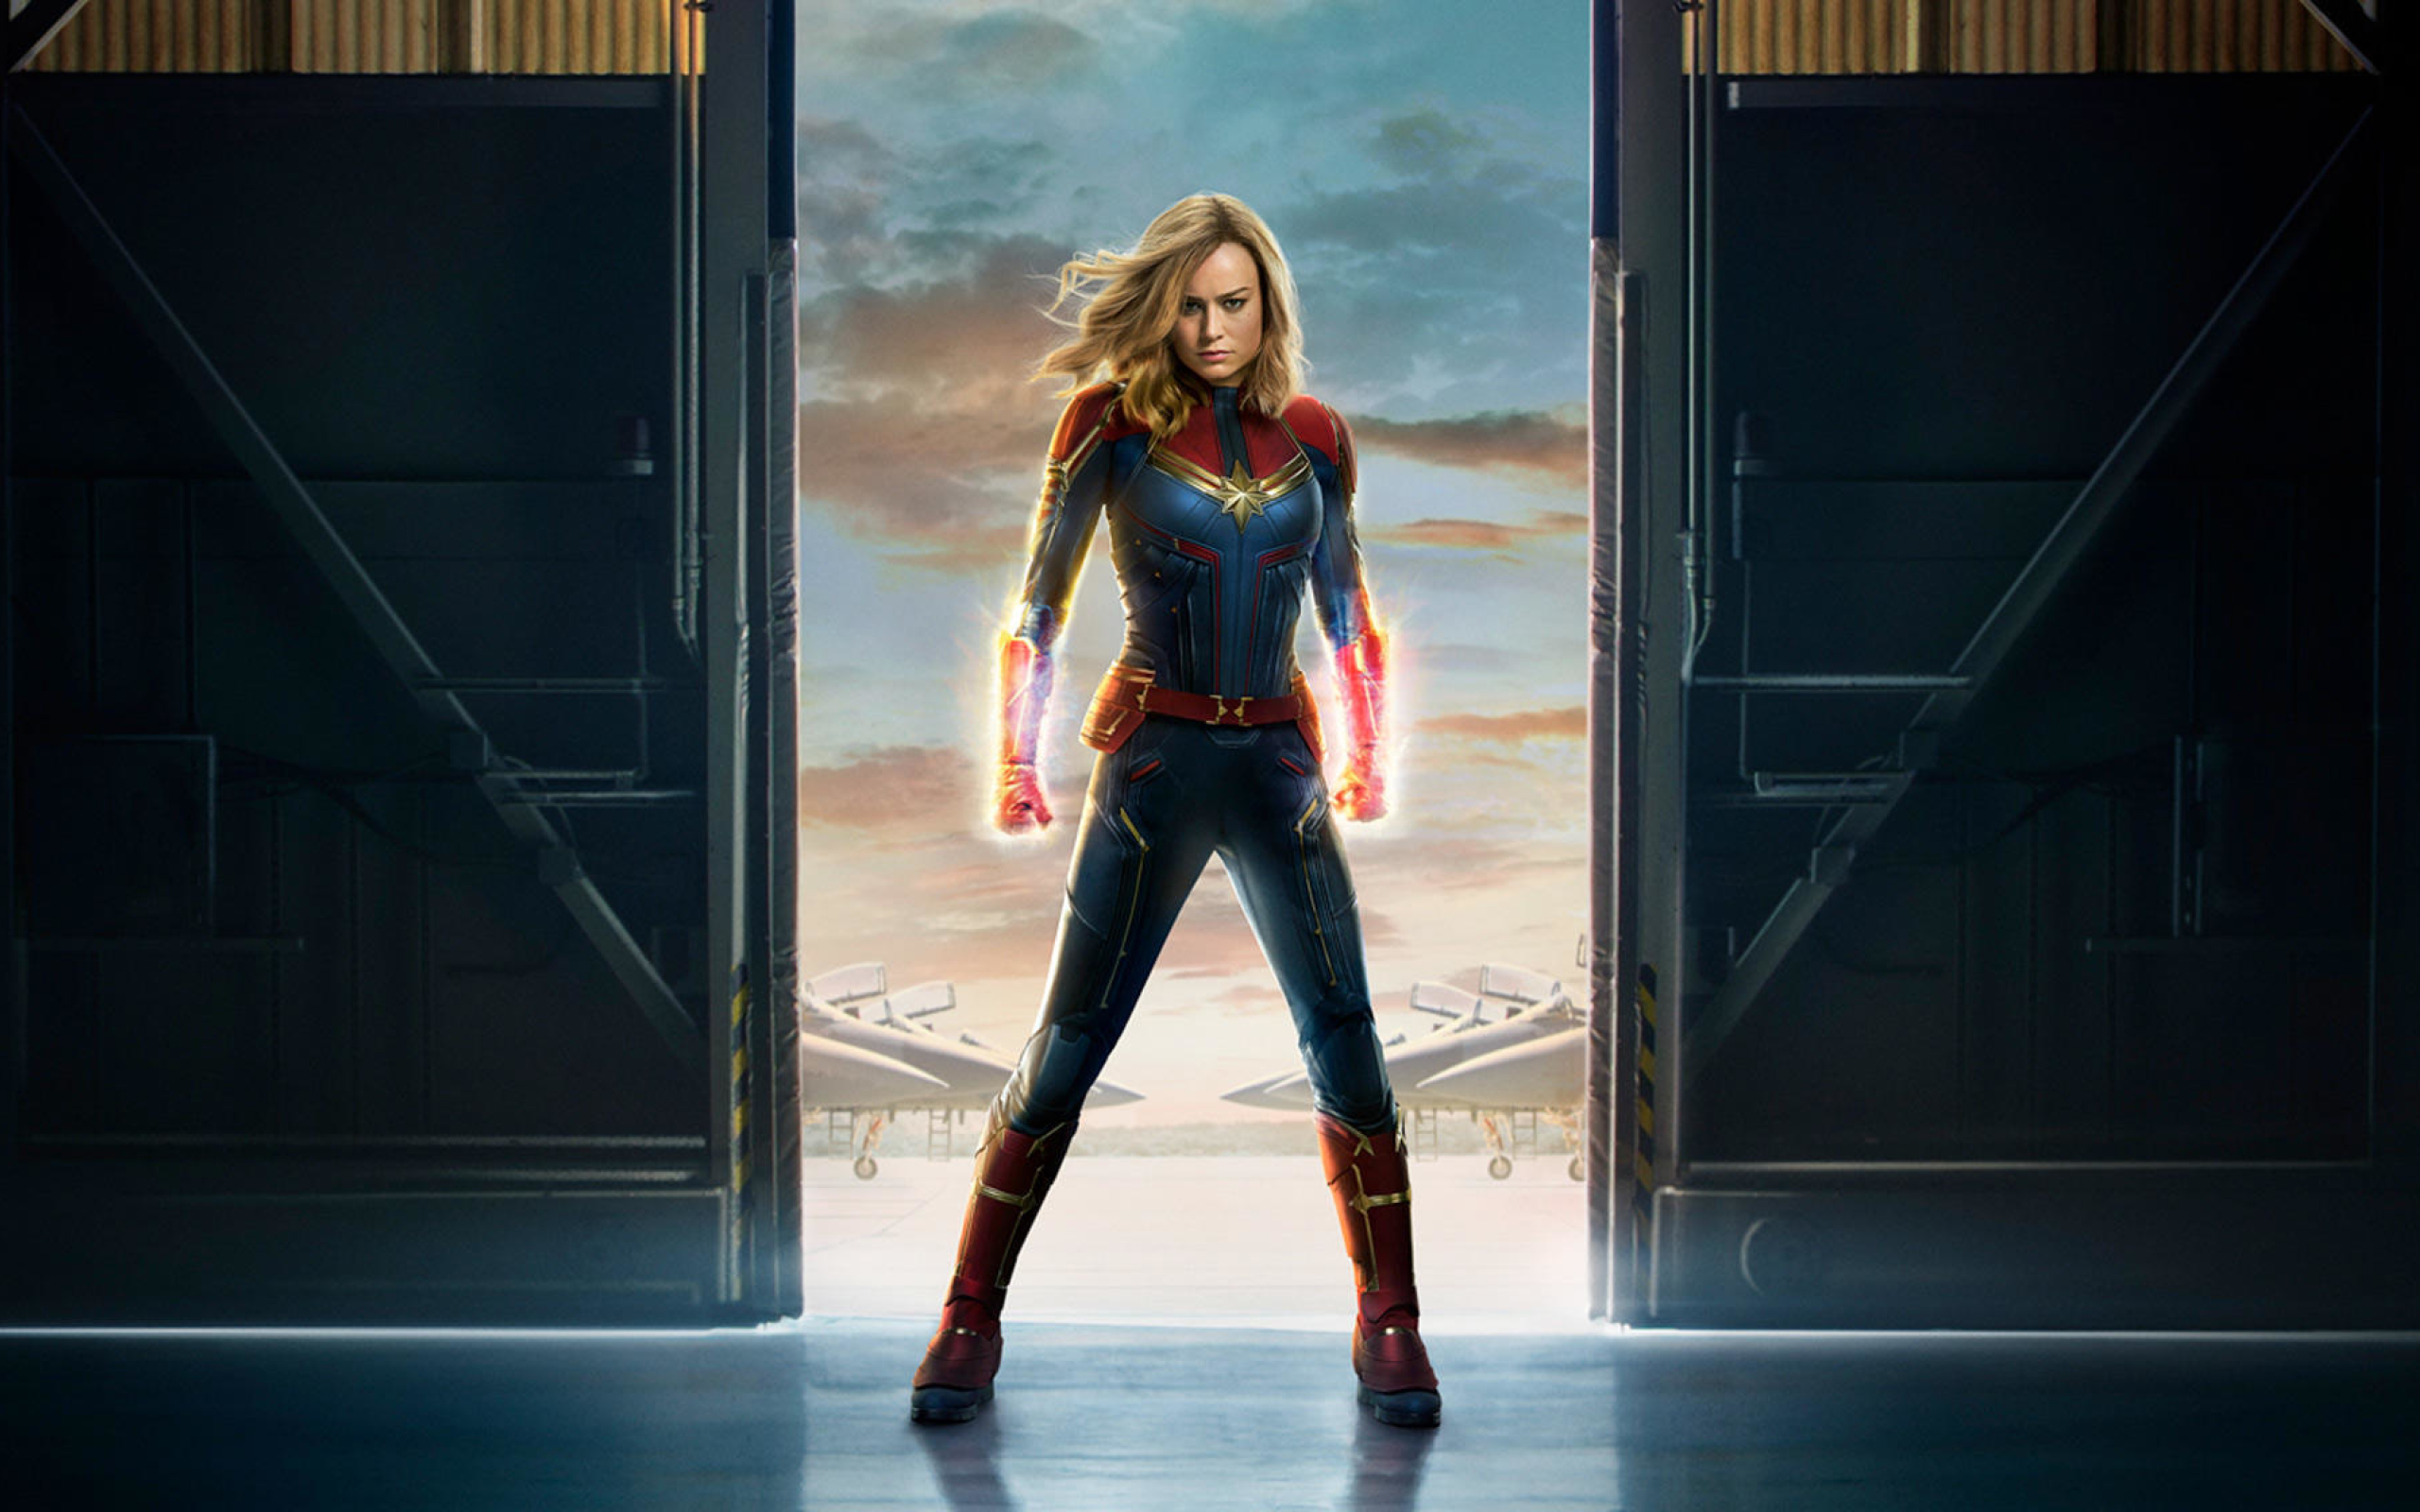 Movie Poster 2019: Captain Marvel 2019 Movie Official Poster, Full HD 2K